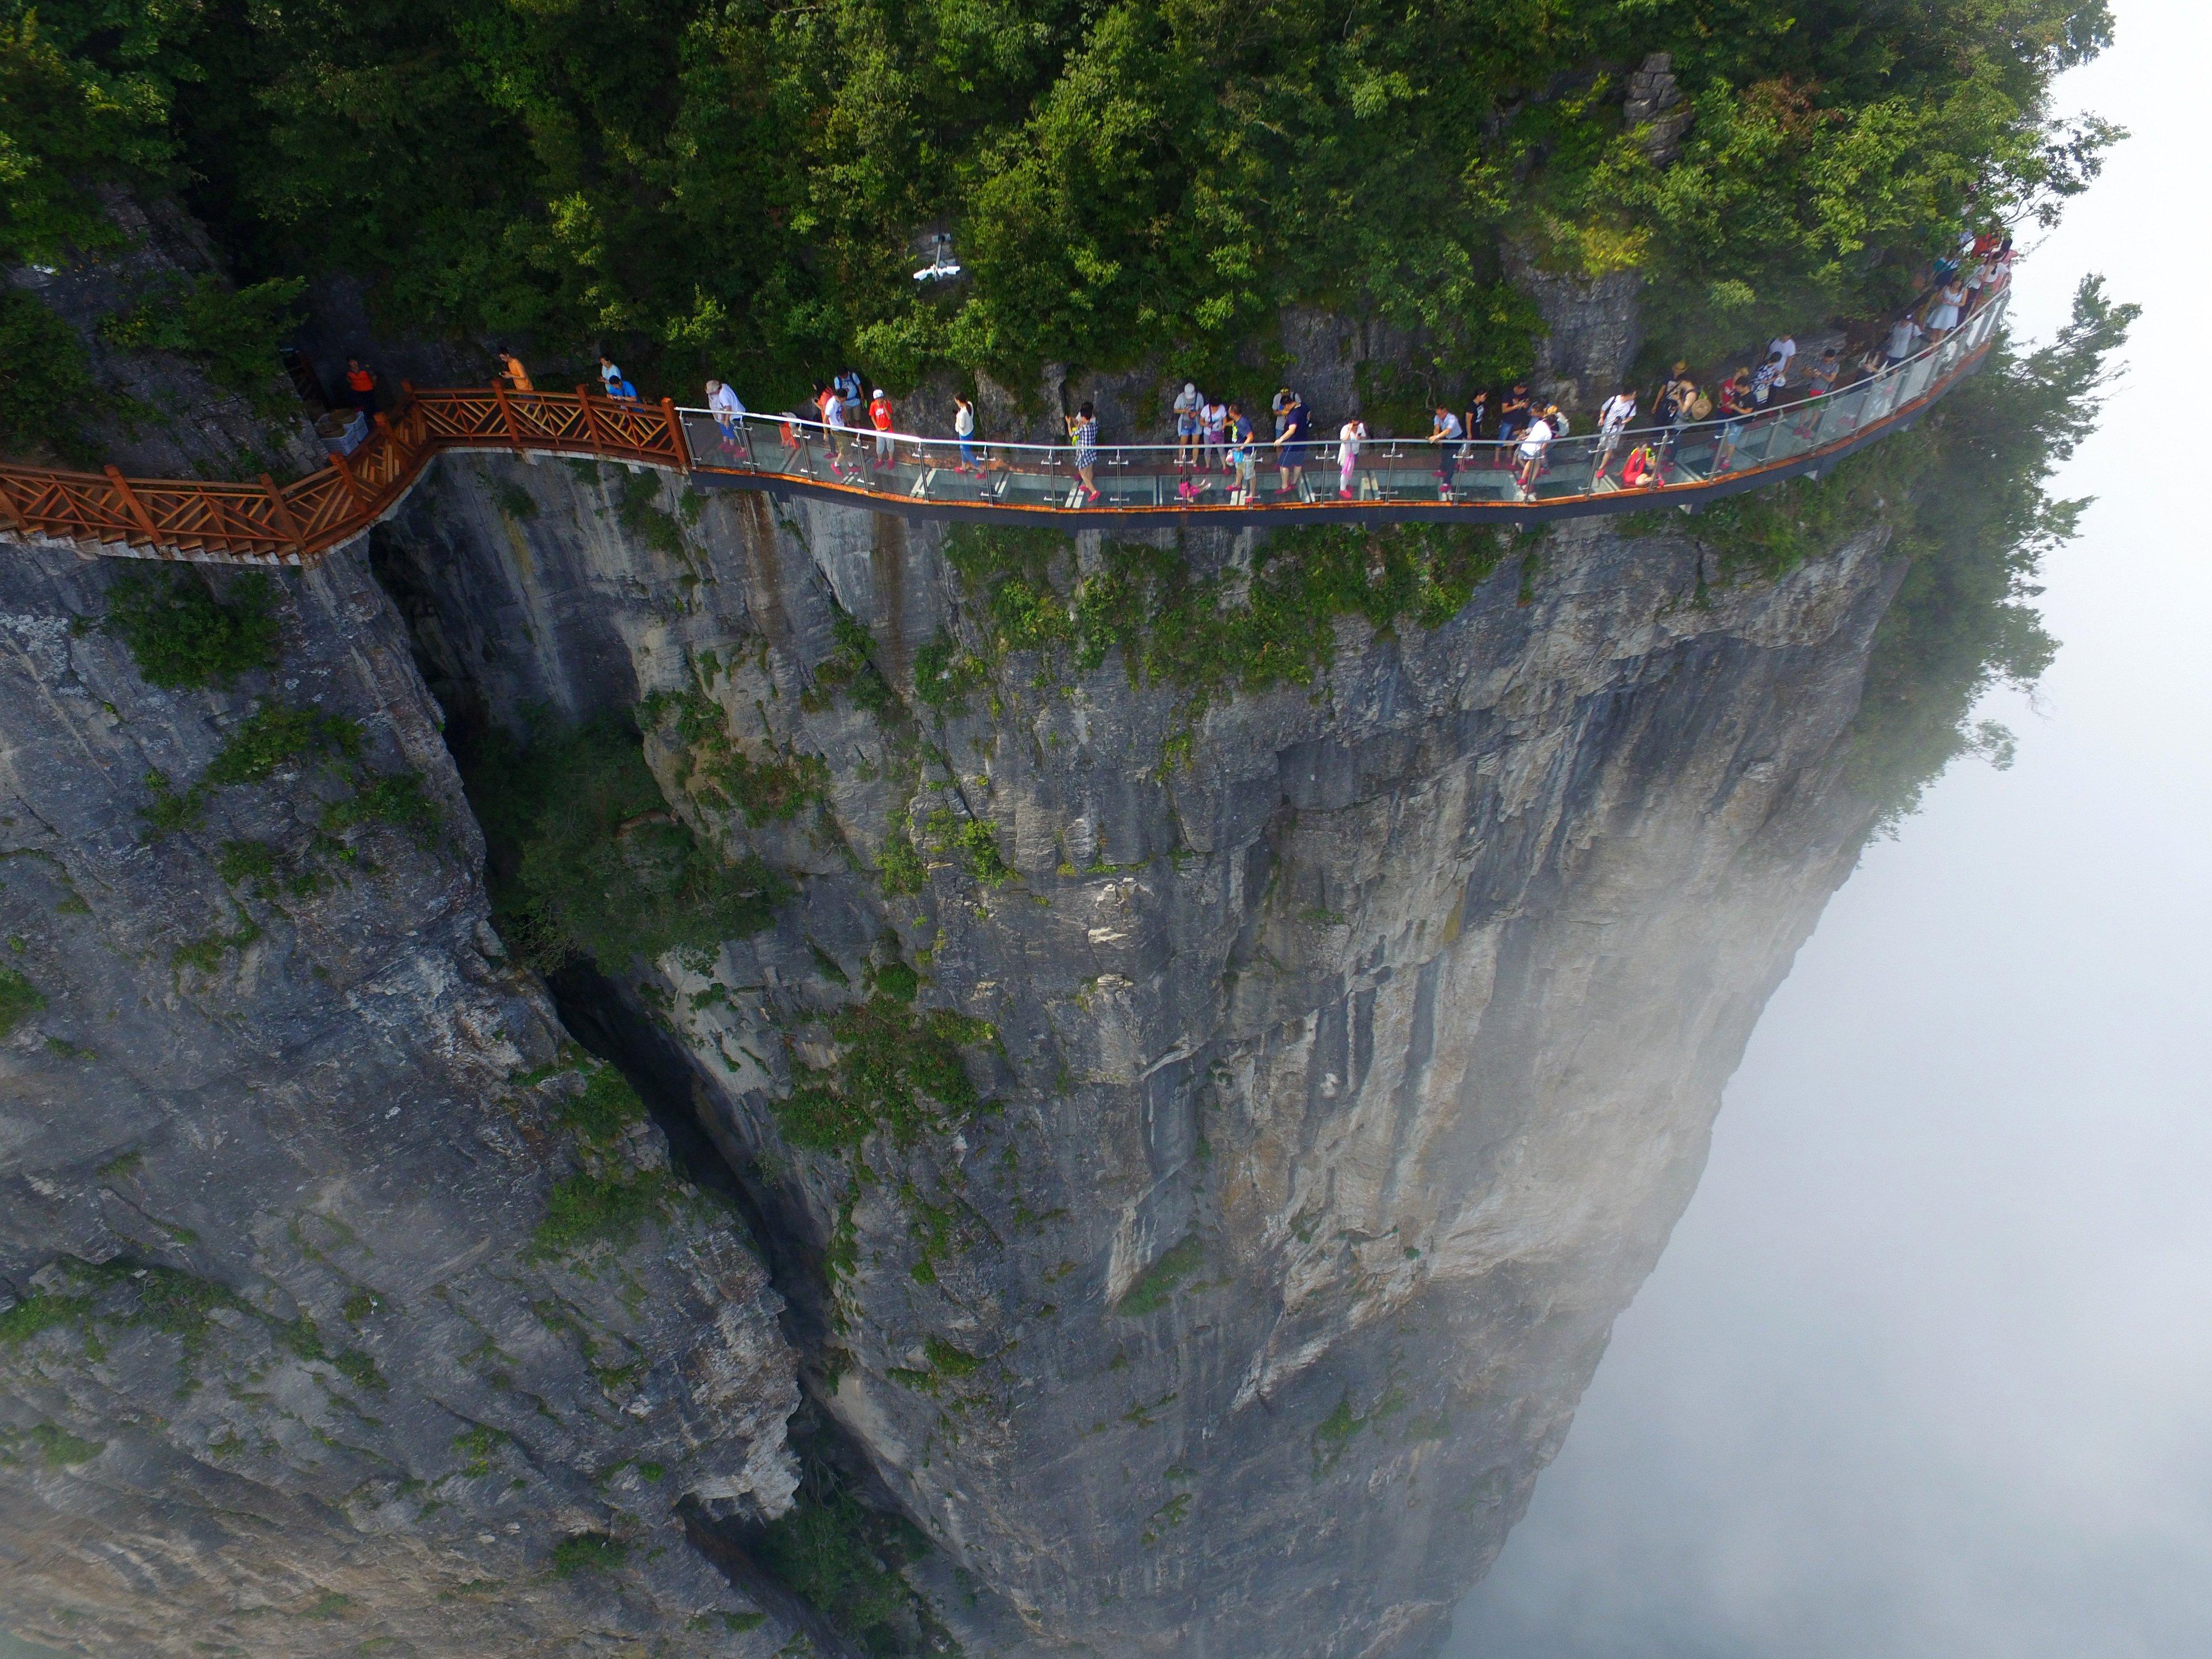 Tourists walking on the glass skywalk clung the cliff of Tianmen Mountain, on Aug. 1, 2016 in Zhangjiajie, China.